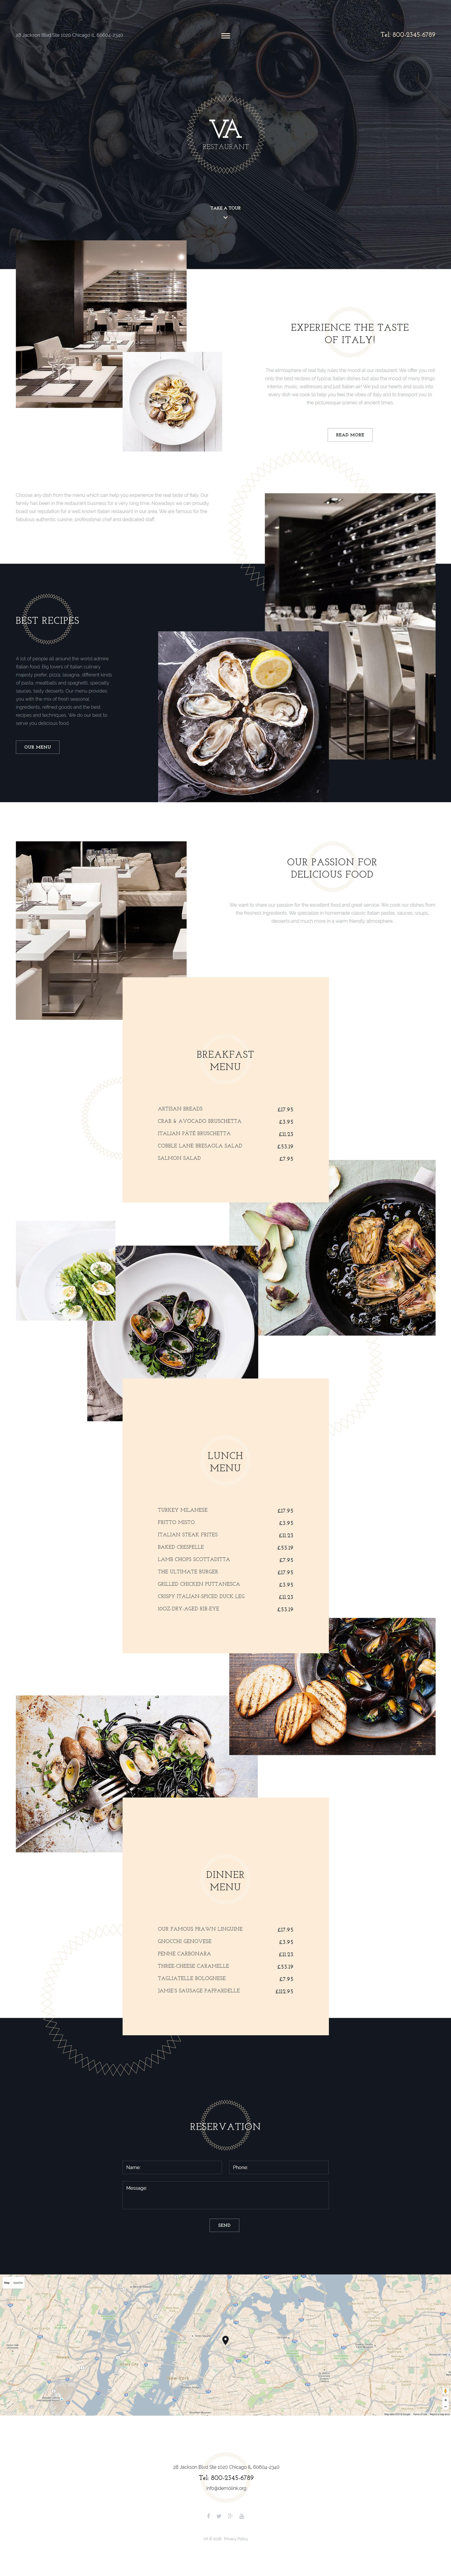 VA Restaurant Joomla Template - screenshot